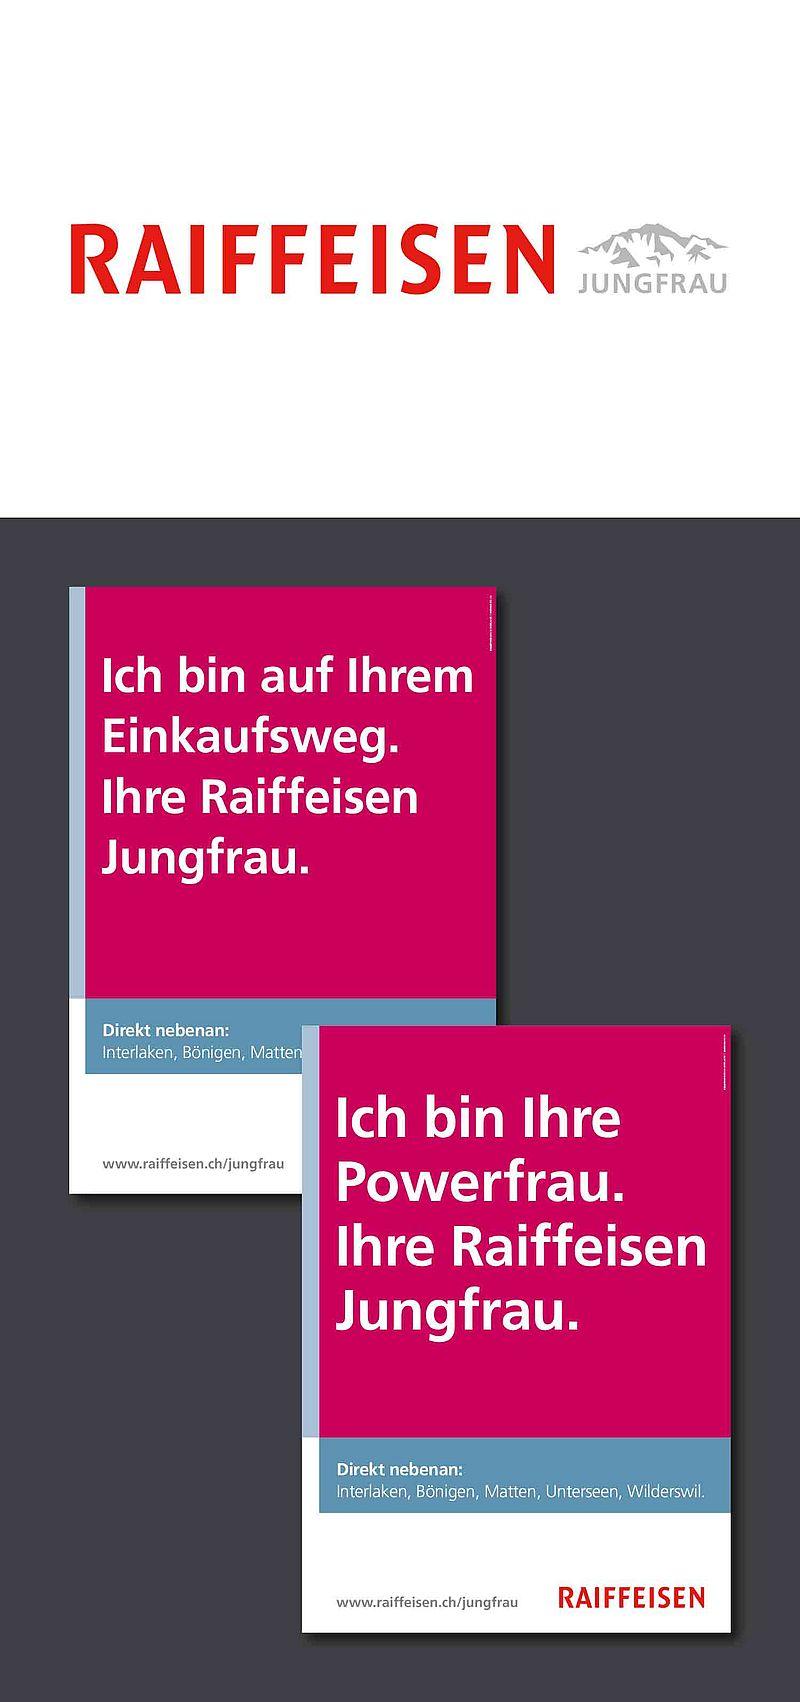 Raiffeisenbank Jungfrau